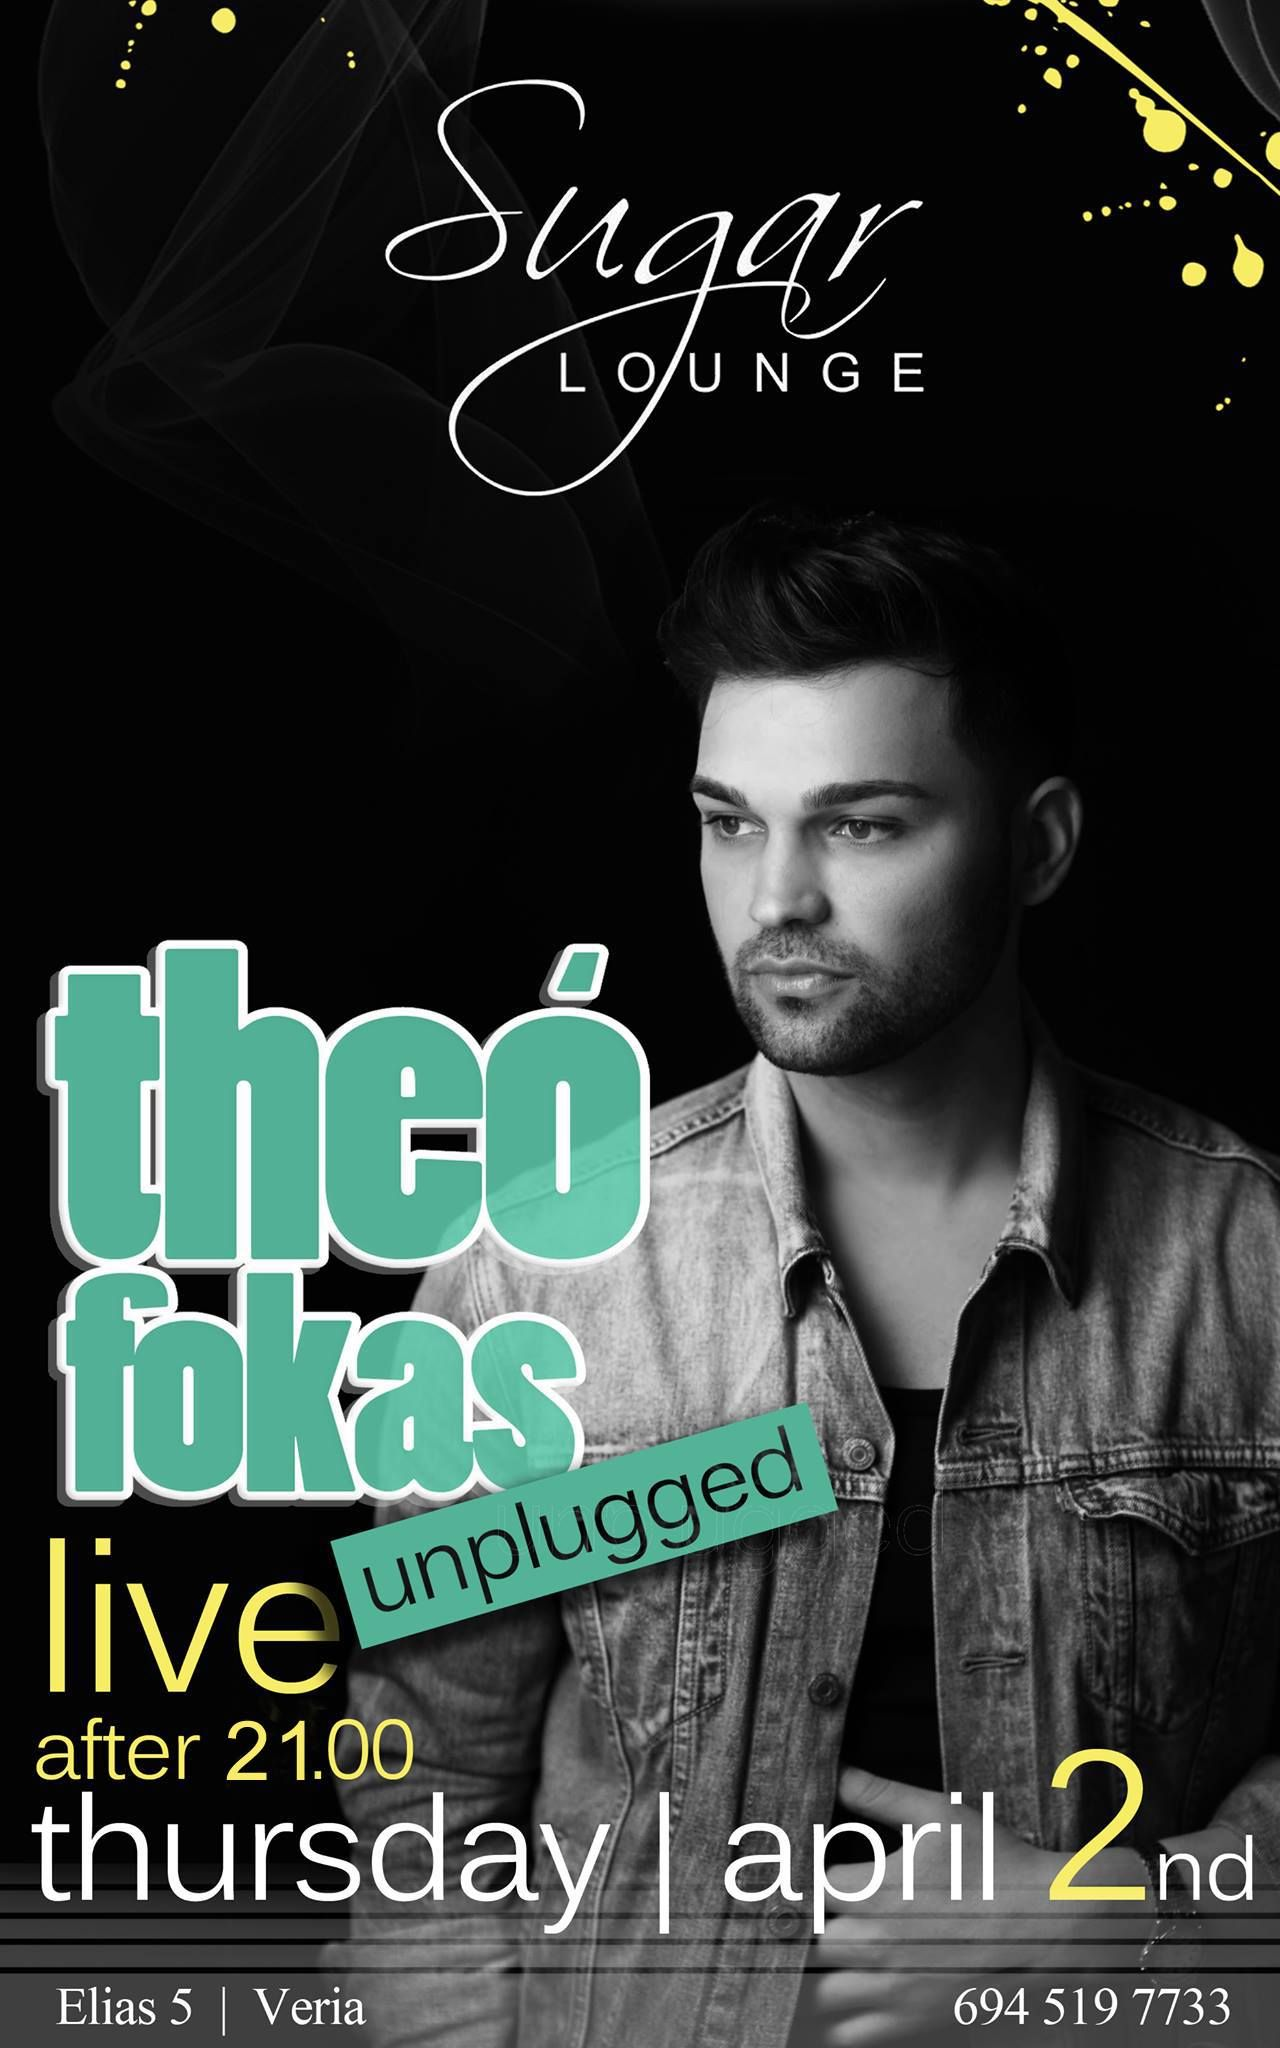 Sugar Lounge - Theo Fokas Unplugged | Verialife